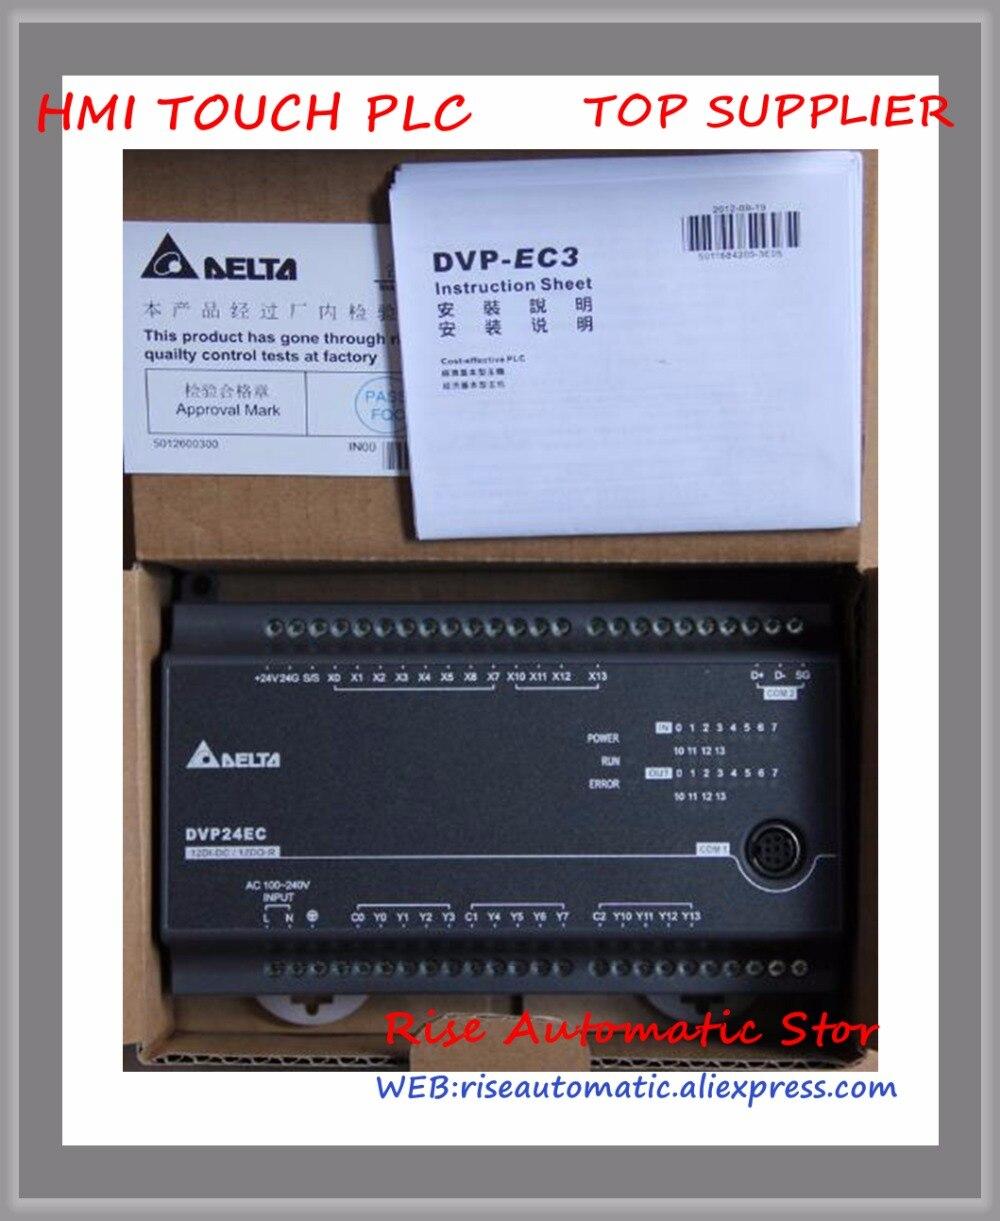 New Original DVP24EC00R2 DVP24EC00R3 PLC DI 12 DO 12 Relay 100-240VAC 100% test good quality new original security plc module 3tk2828 1bb41 100% test good quality